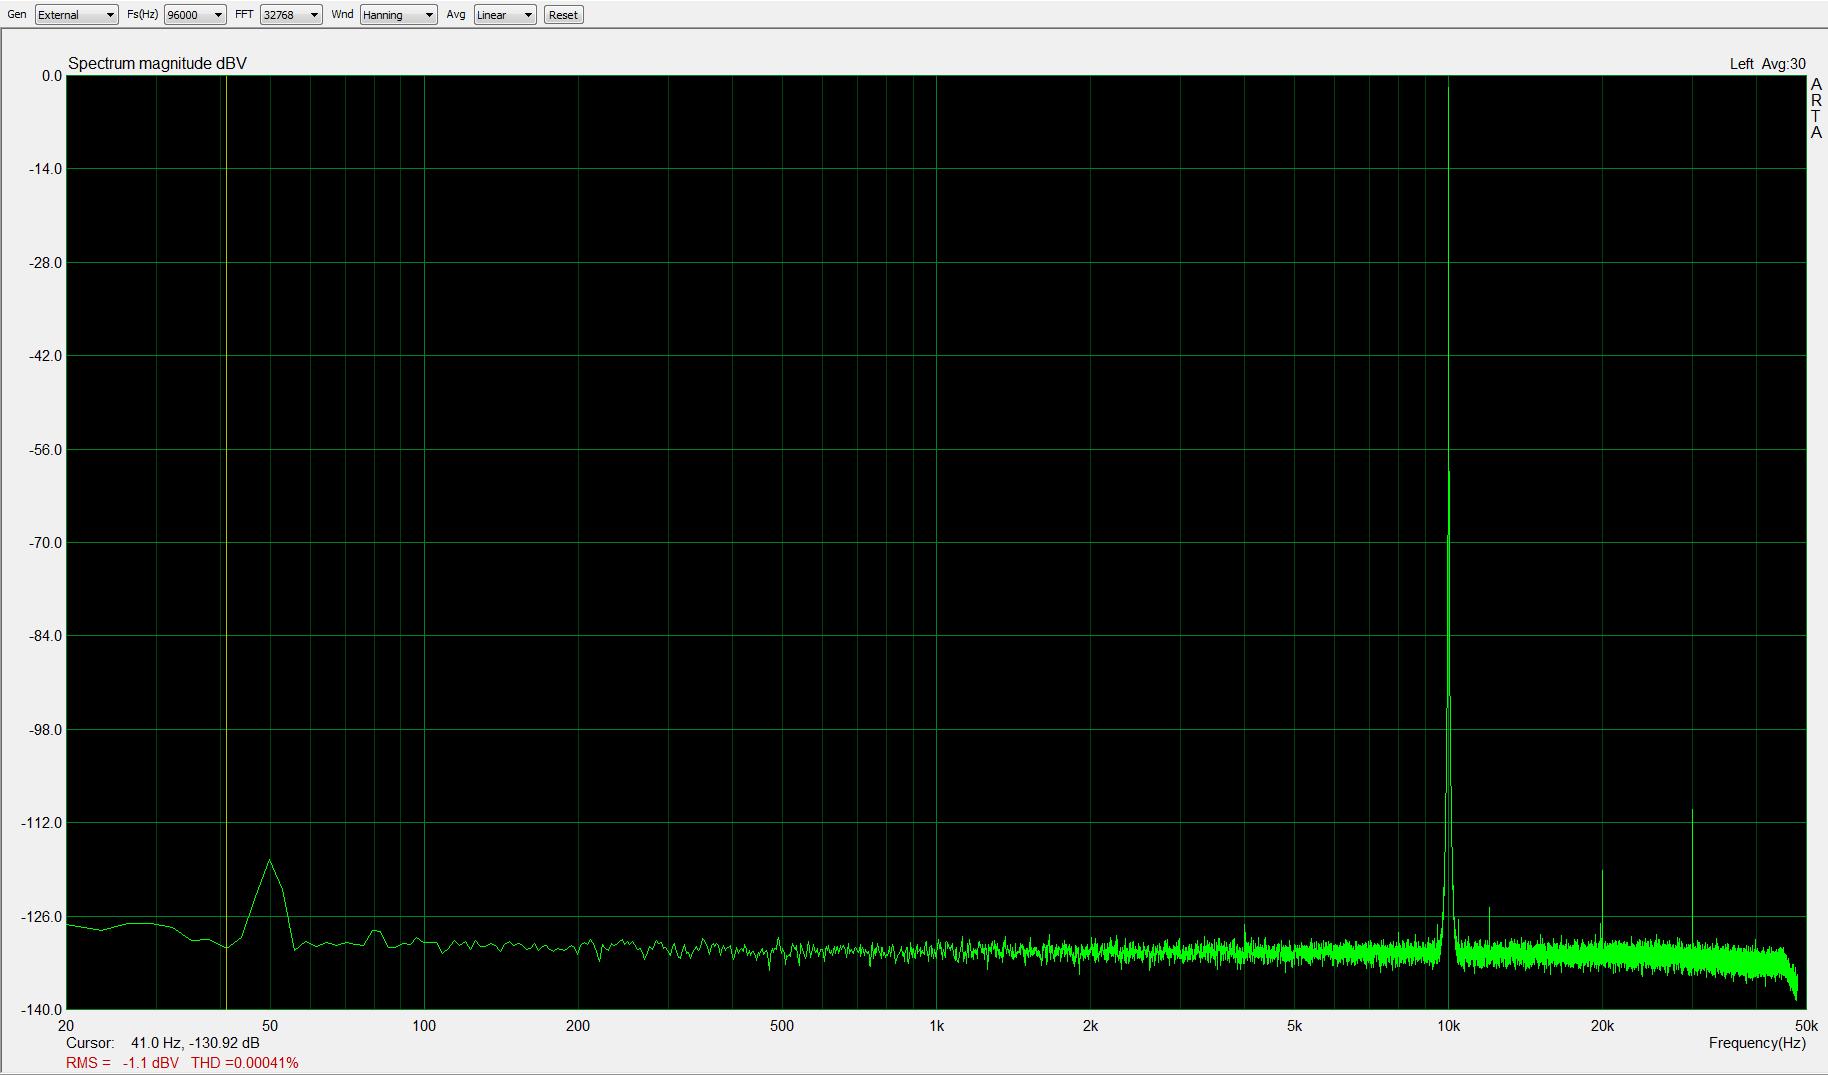 10kHz, -1dBFS, fs=96kHz; THD < 0,0005%